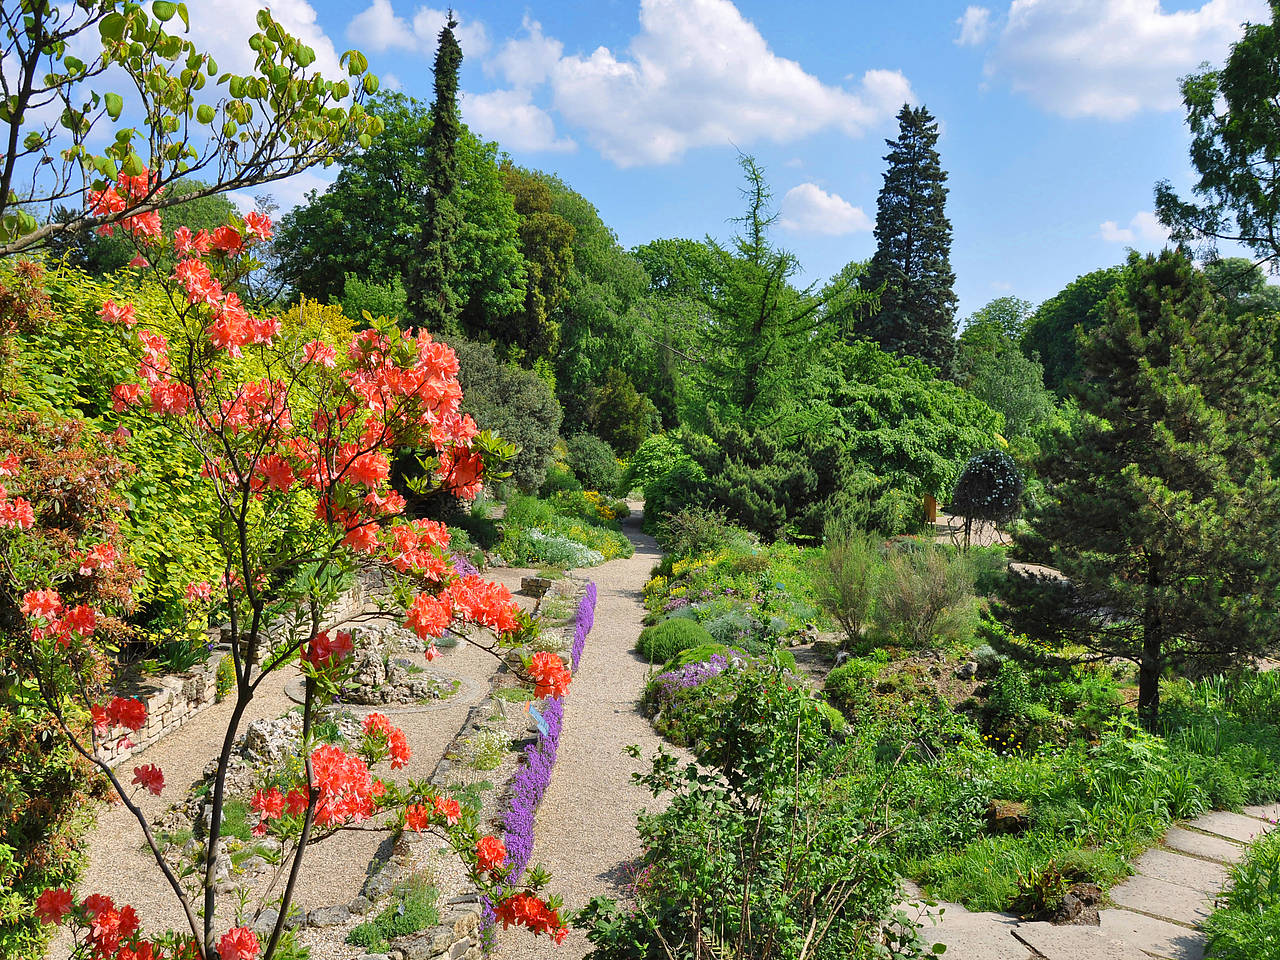 Fotos Jardin des Plantes in Paris in Bildergalerie - Jardin ...